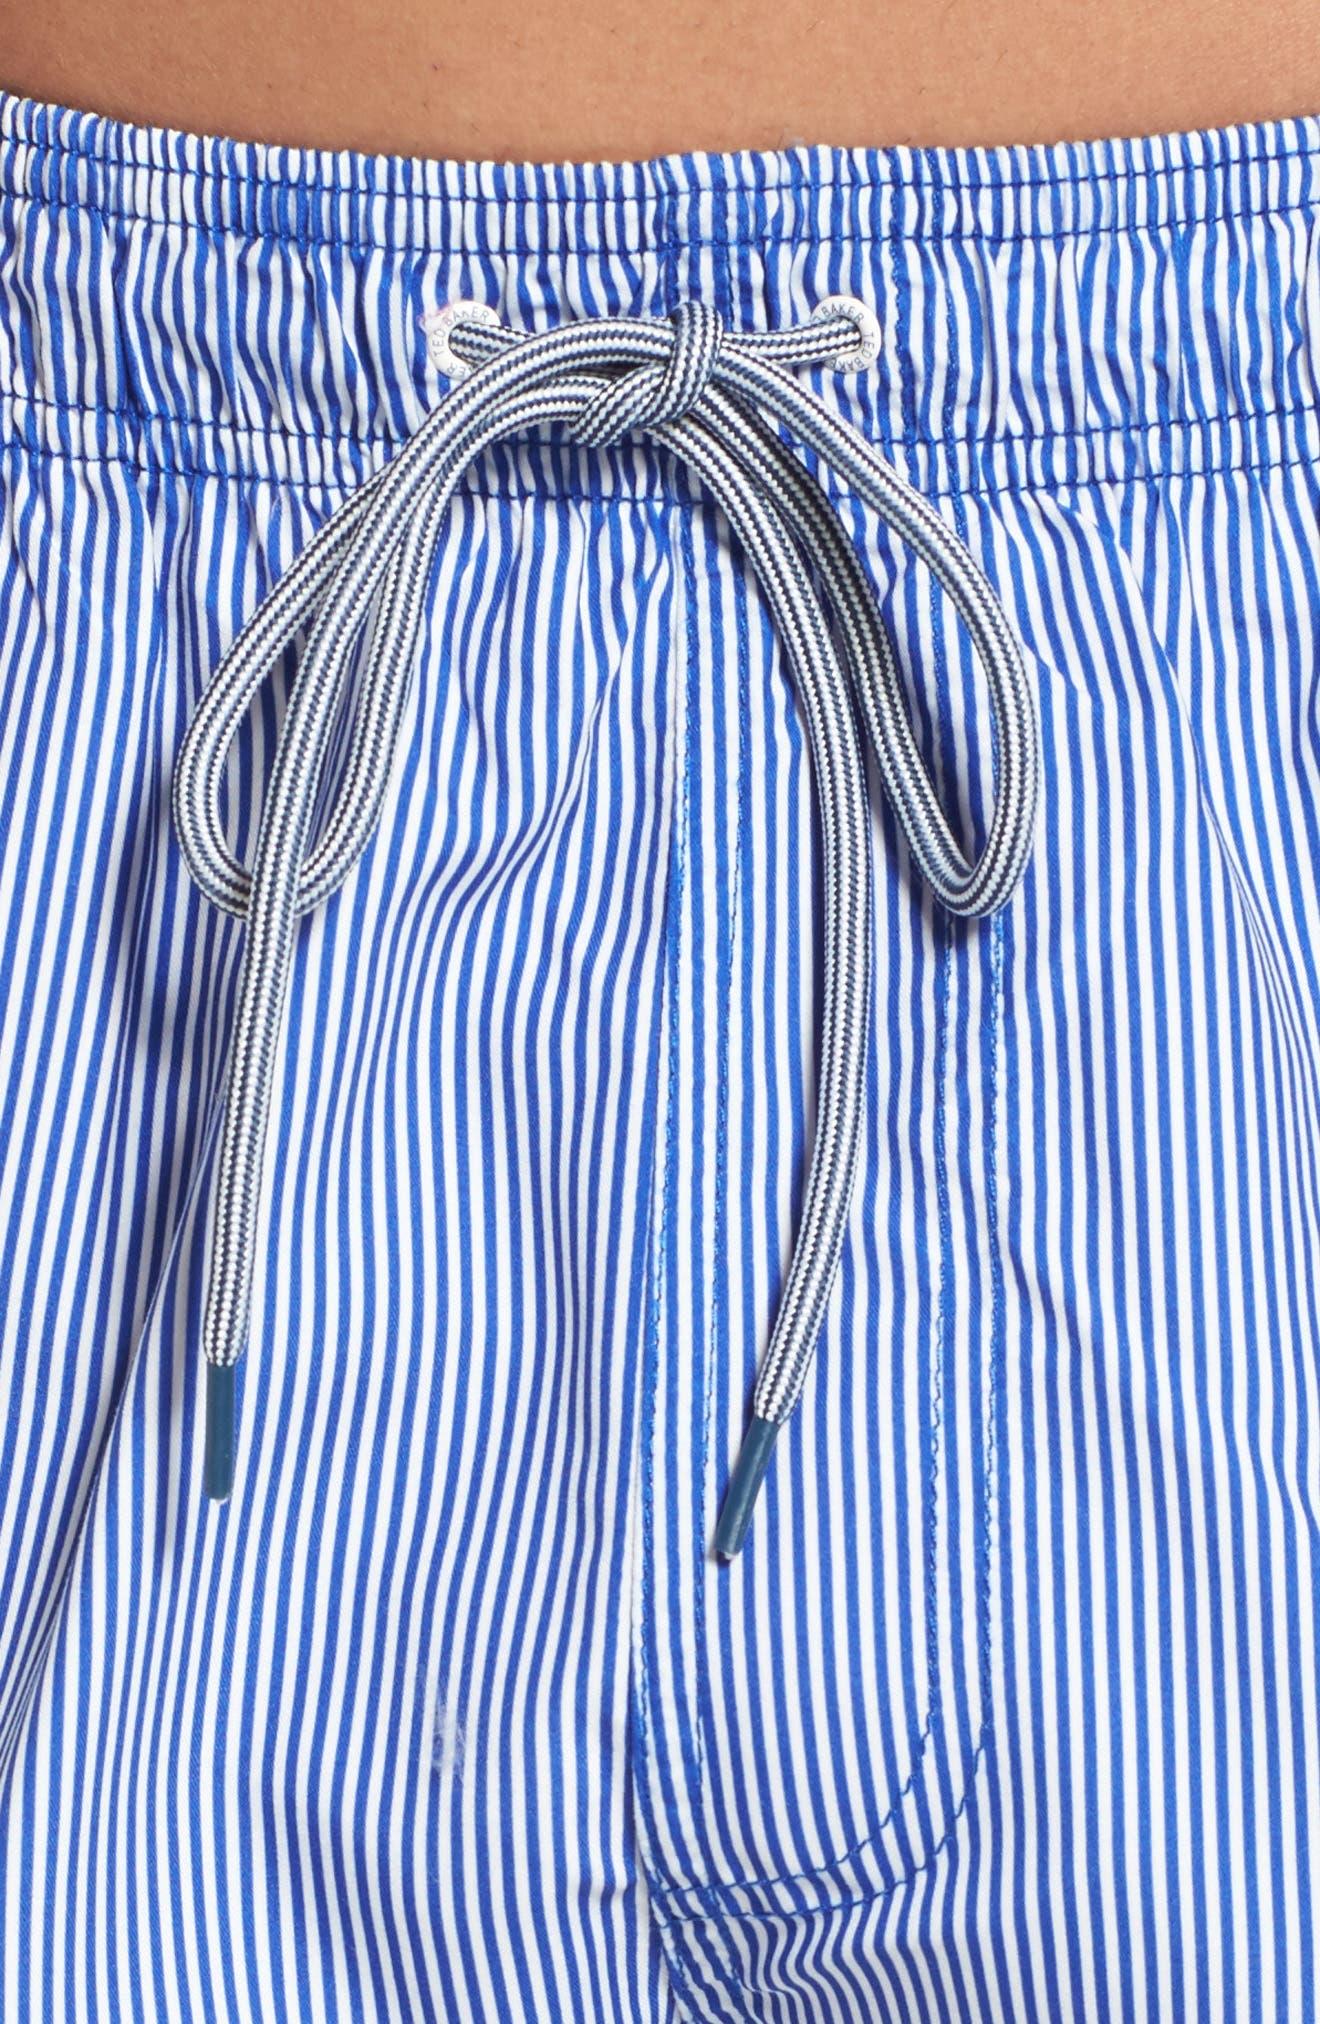 One-Way Stripe Swim Trunks,                             Alternate thumbnail 4, color,                             421